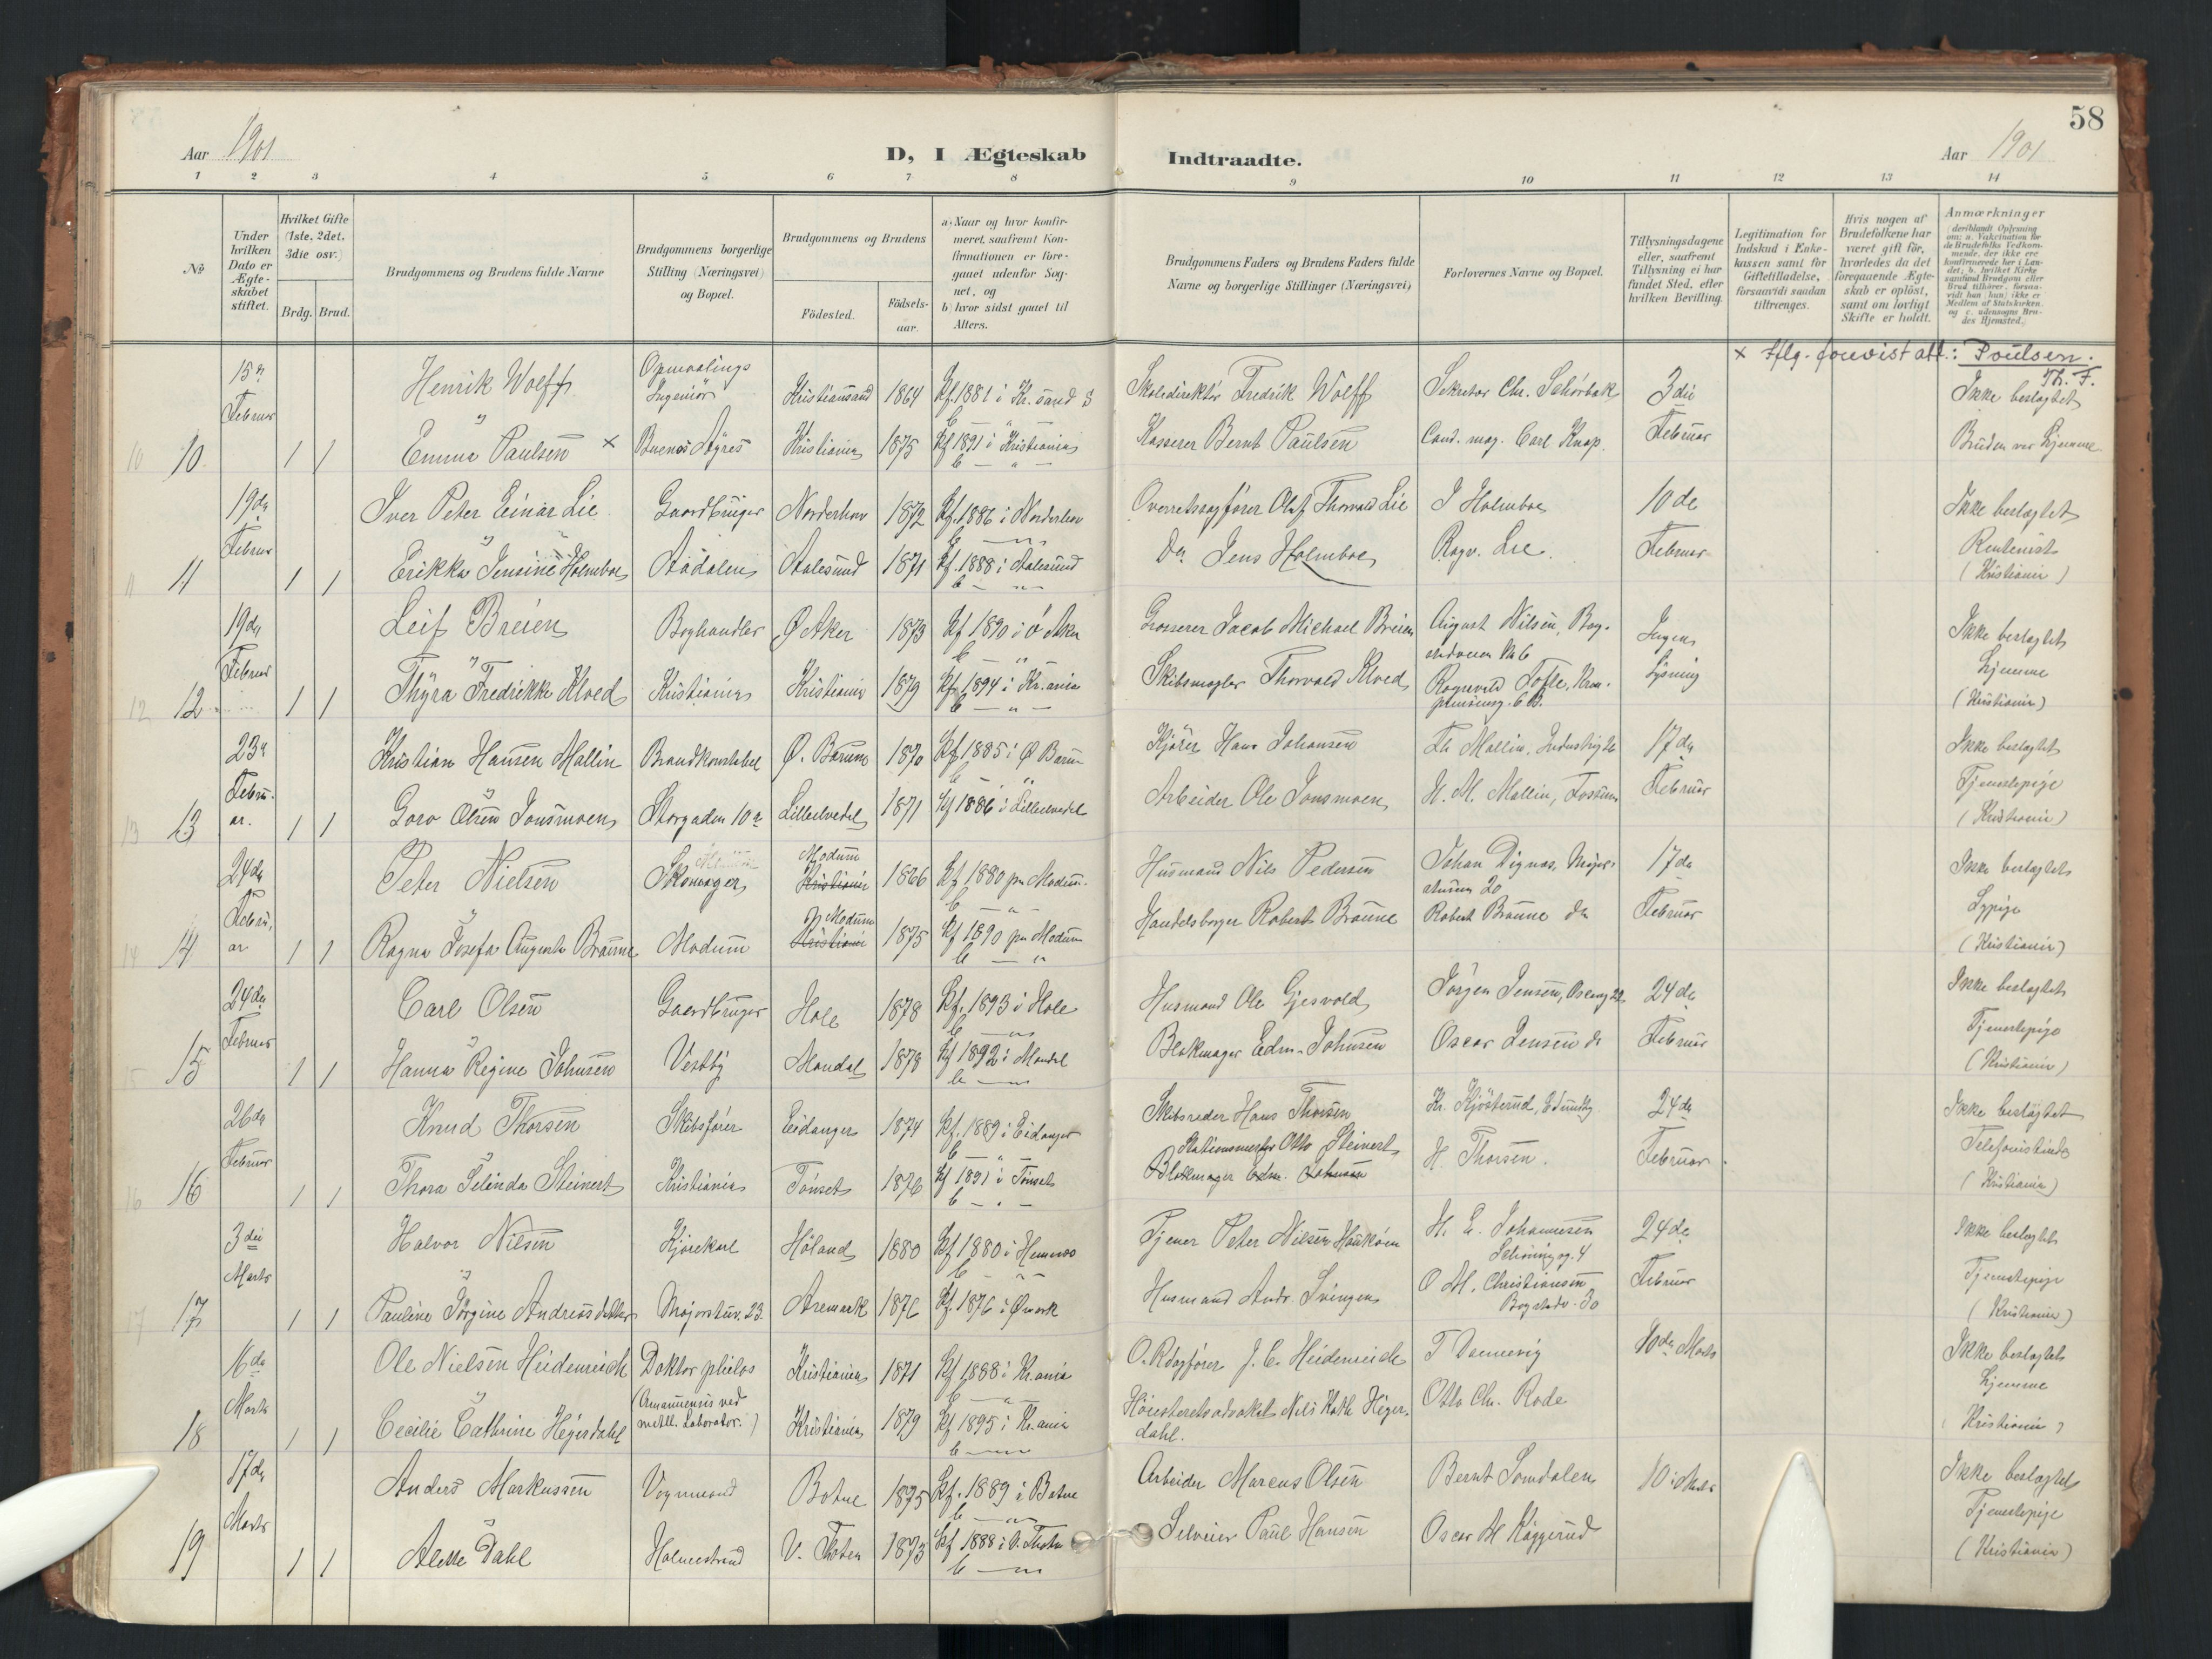 SAO, Uranienborg prestekontor Kirkebøker, F/Fa/L0007: Ministerialbok nr. 7, 1896-1914, s. 58